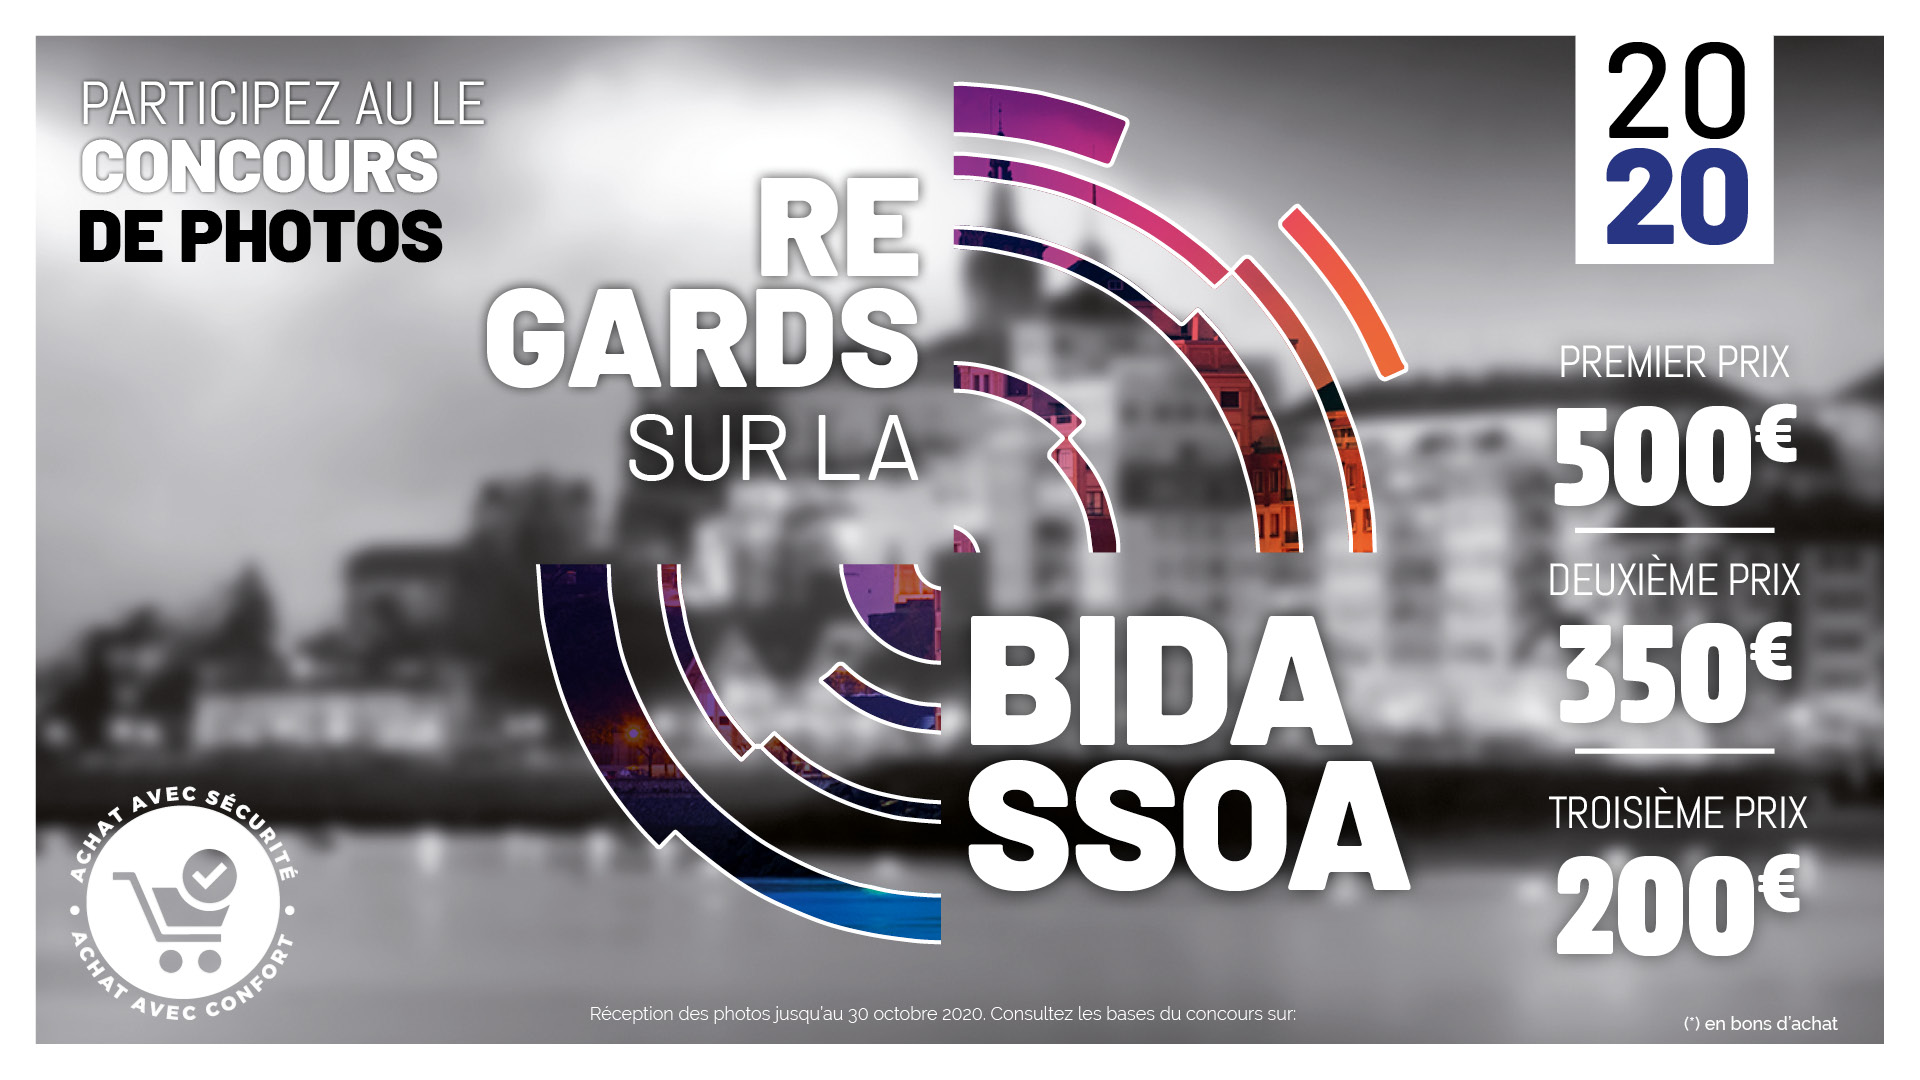 concours photo « REGARDS SUR LA BIDASSOA 2020»